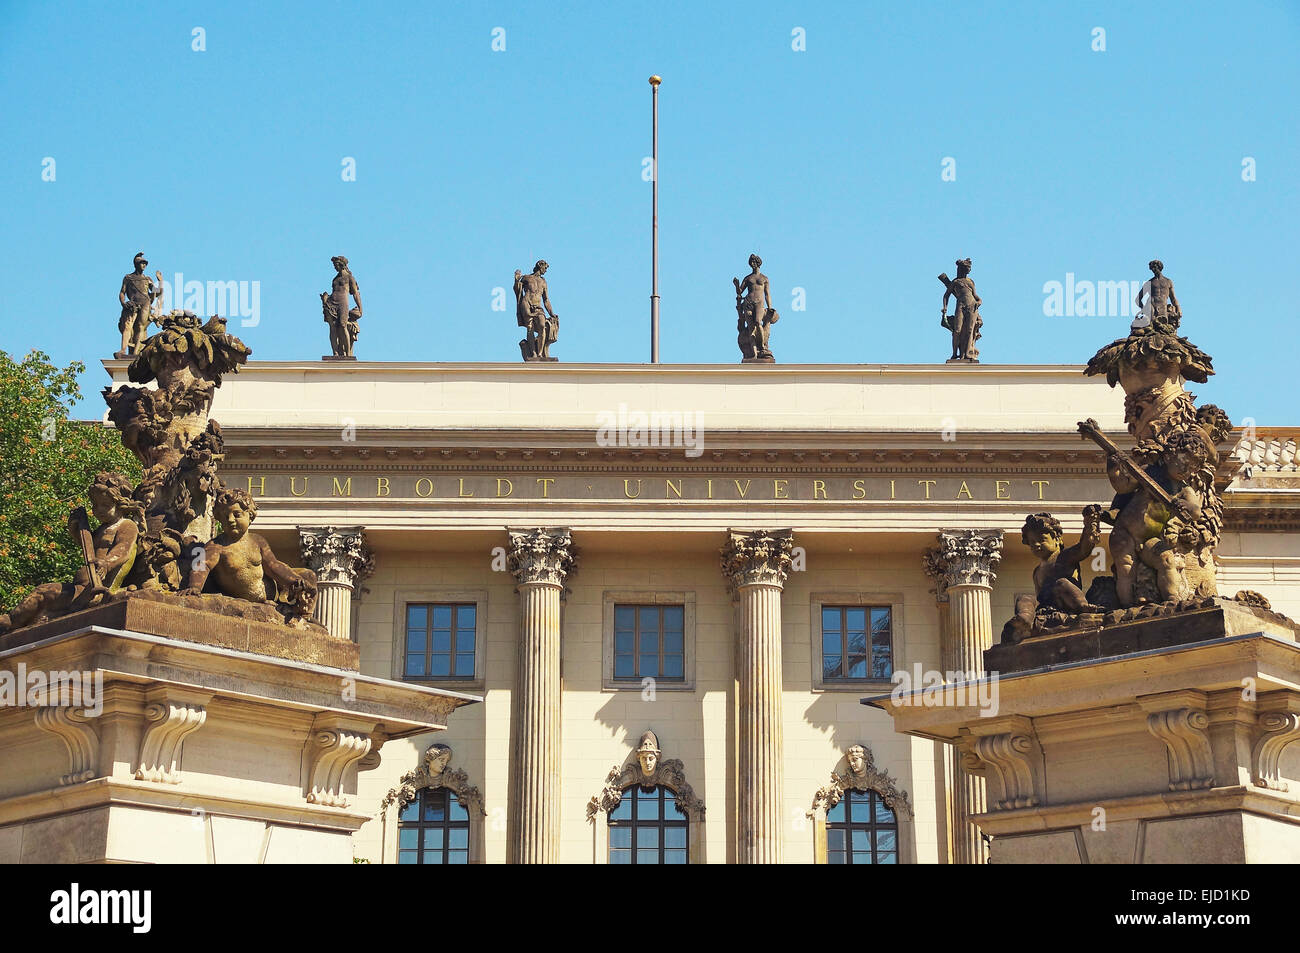 Humboldt University Berlin Germany - Stock Image